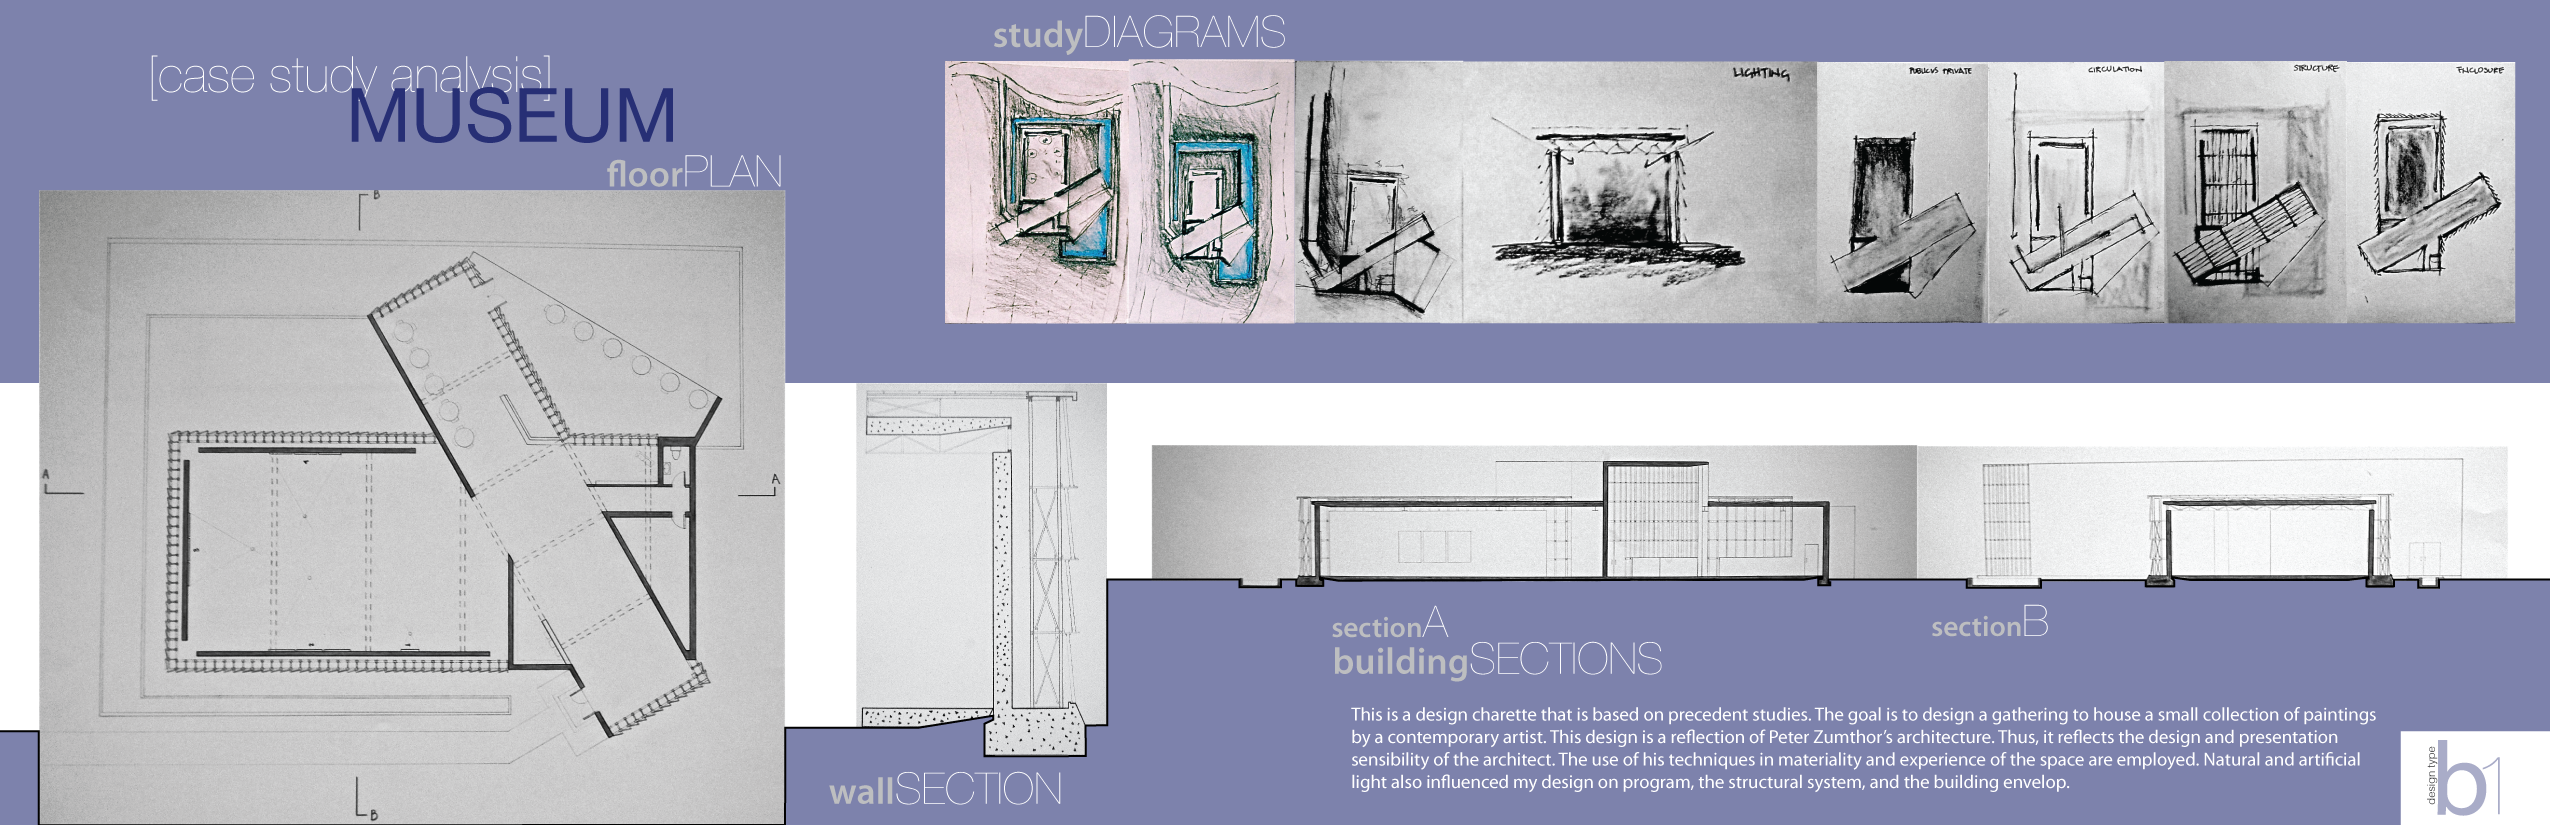 case study analysis - art museum